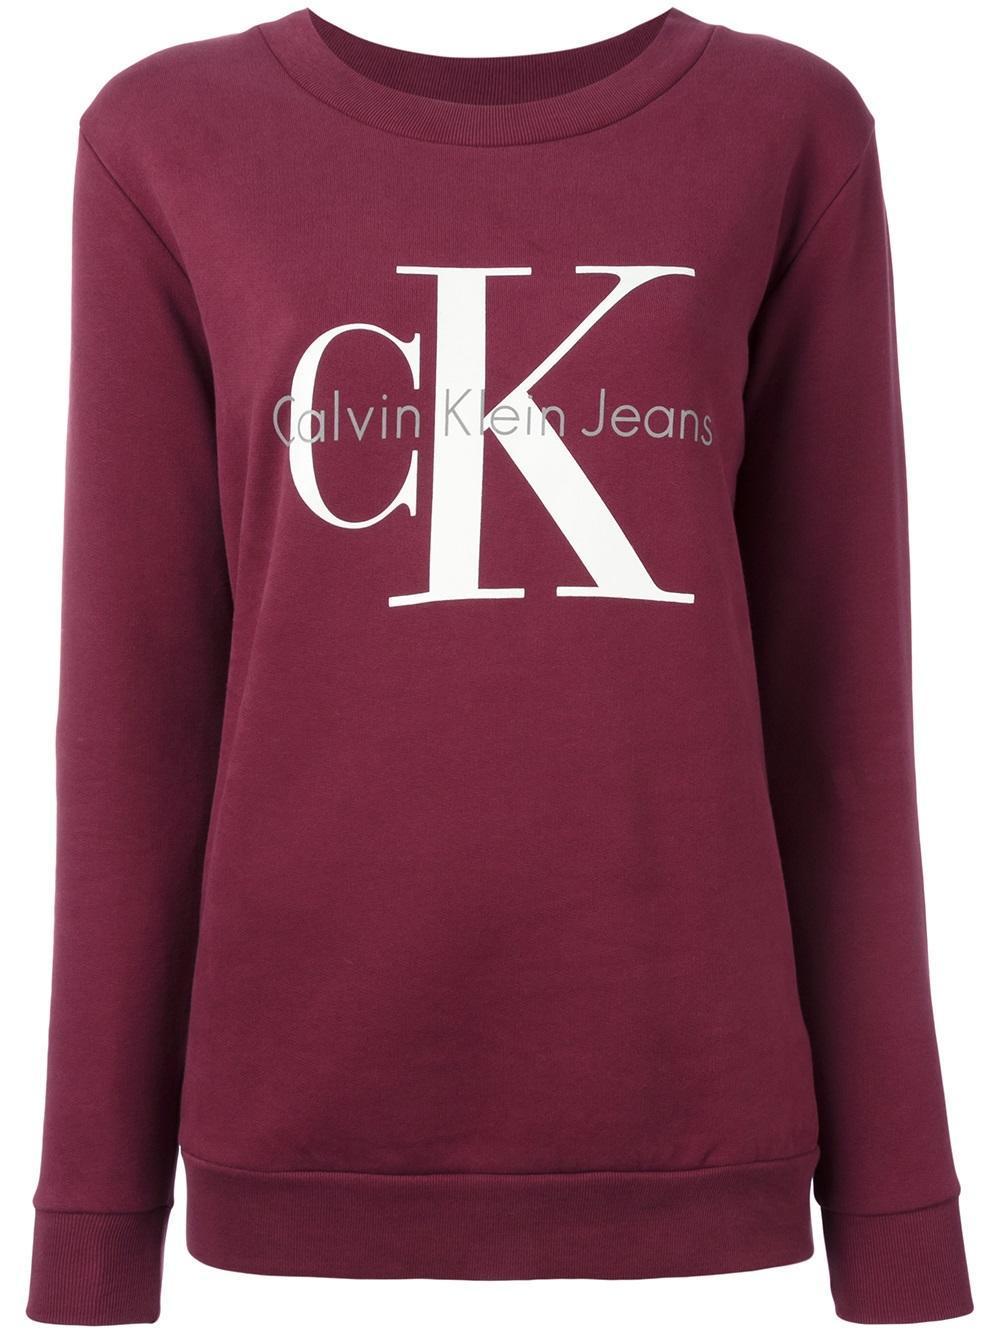 calvin klein jeans logo print sweatshirt in red lyst. Black Bedroom Furniture Sets. Home Design Ideas